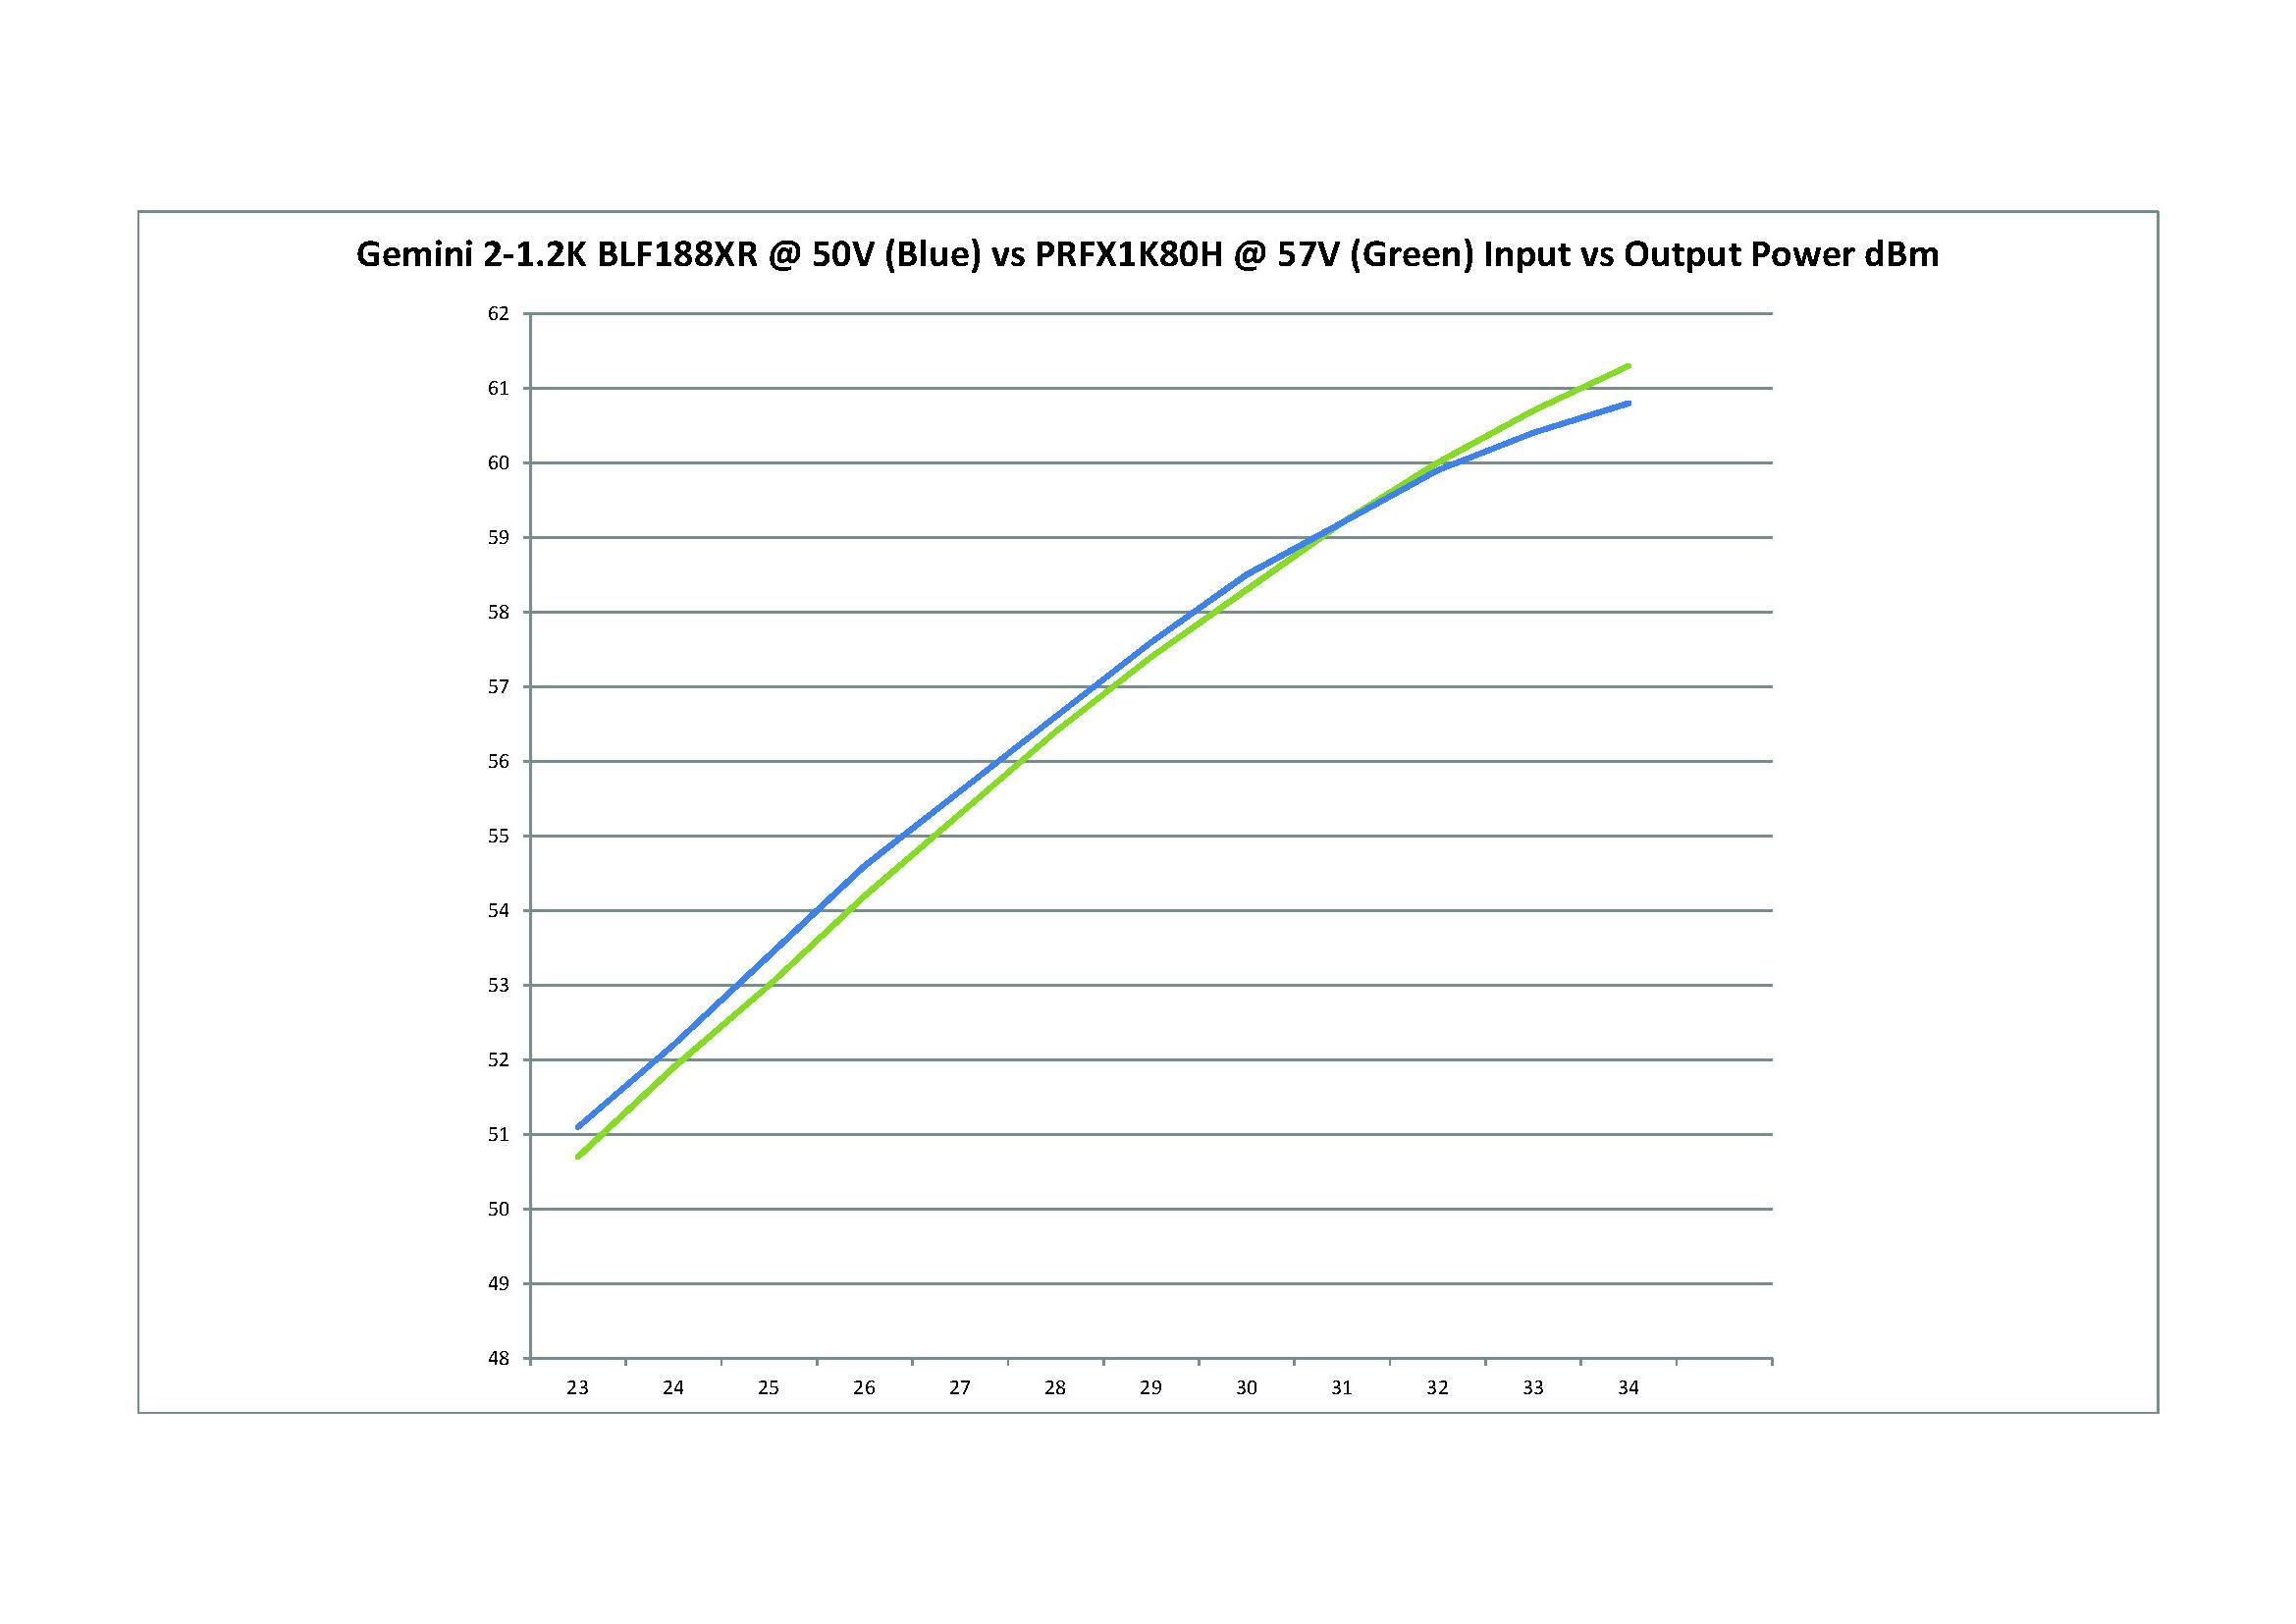 Output power graph for BLF188XR vs MRFX1K80H